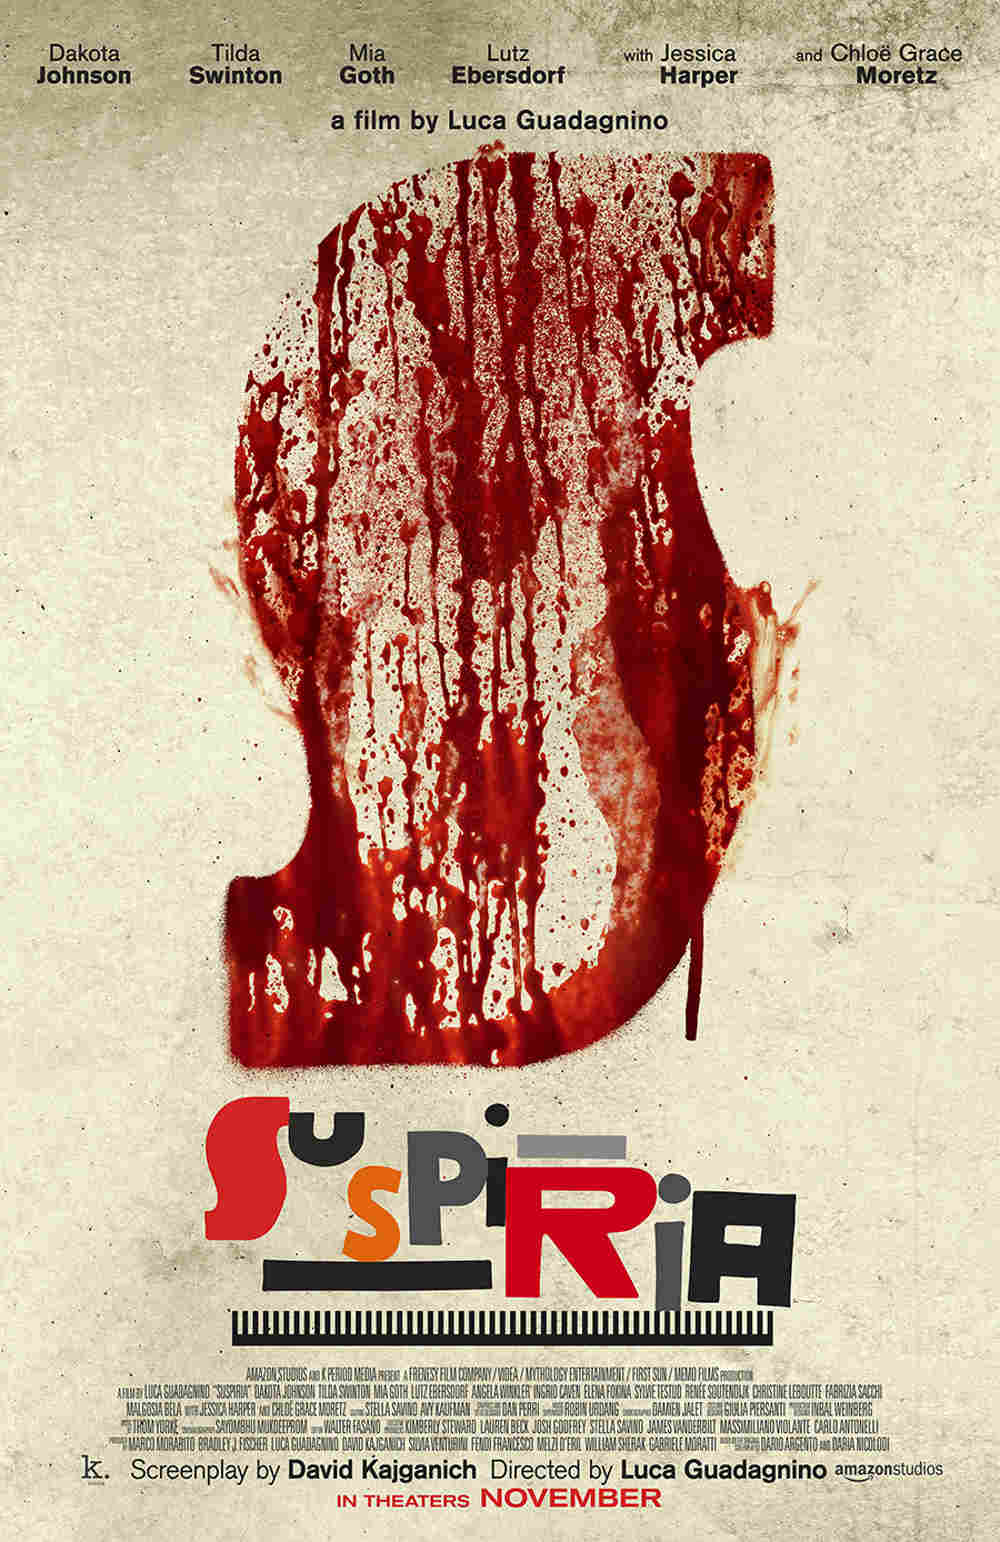 Suspiria - poster remake